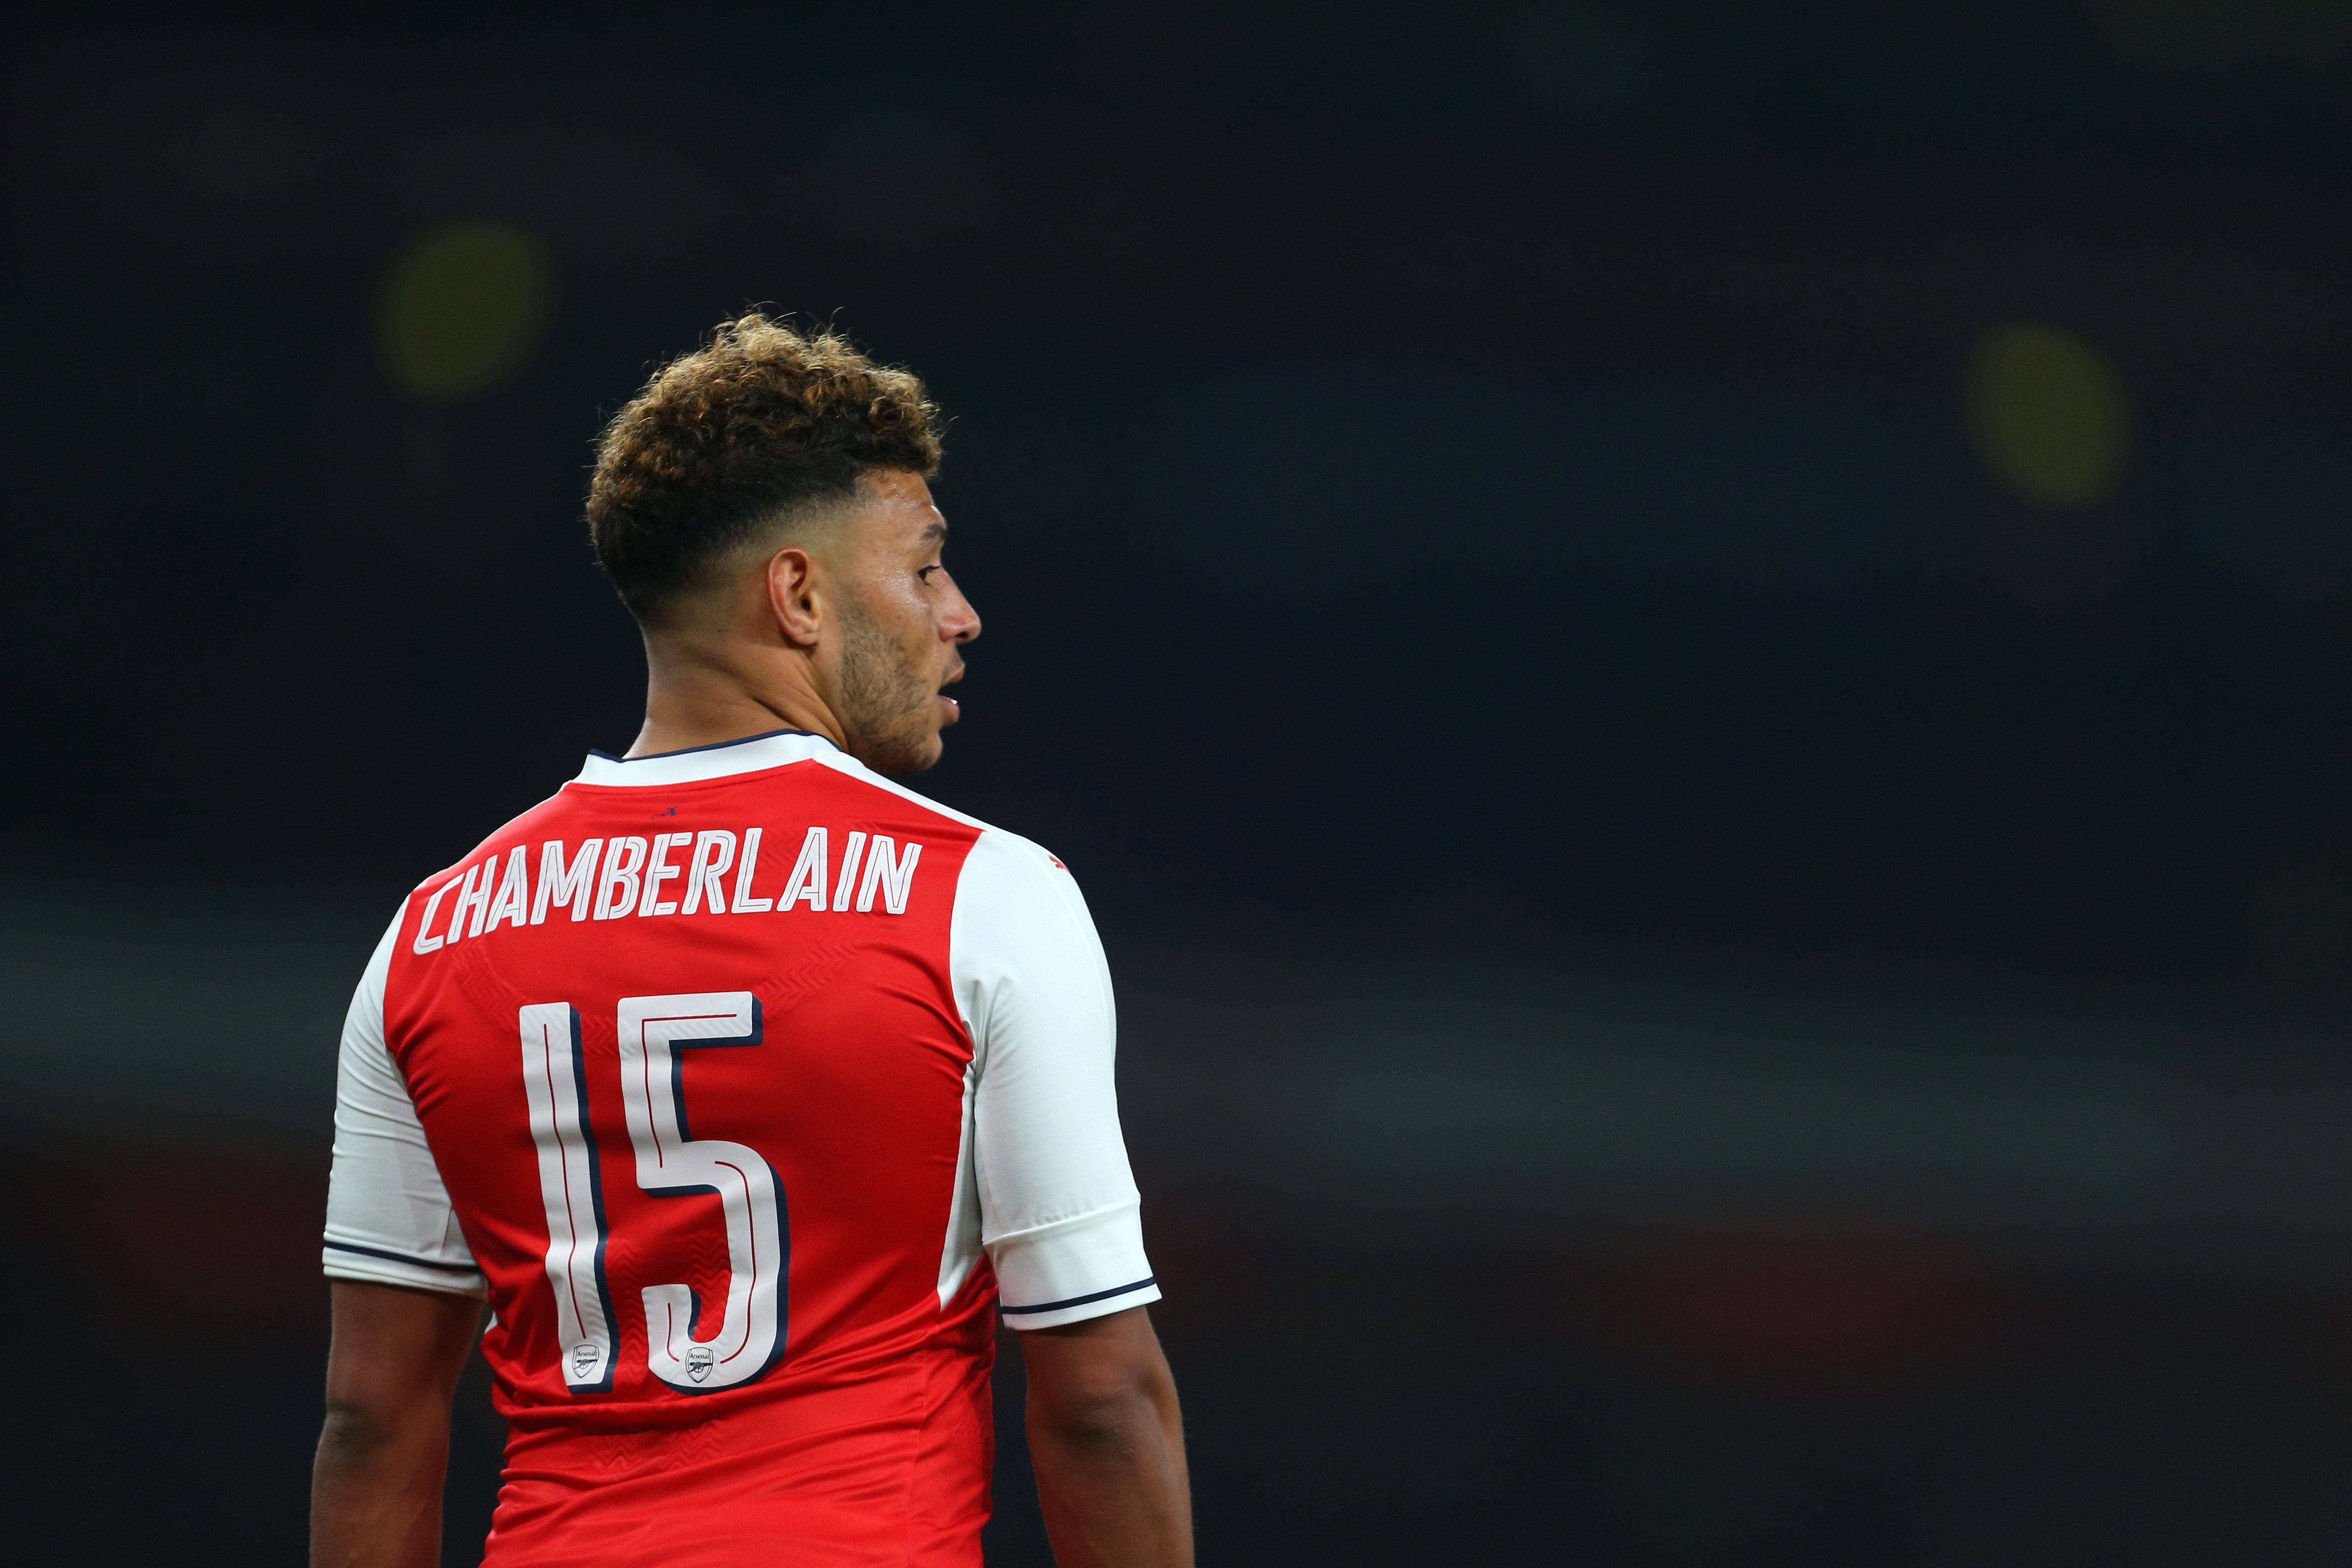 Arsenal Alex Oxlade Chamberlain Must Push For Insightful Move